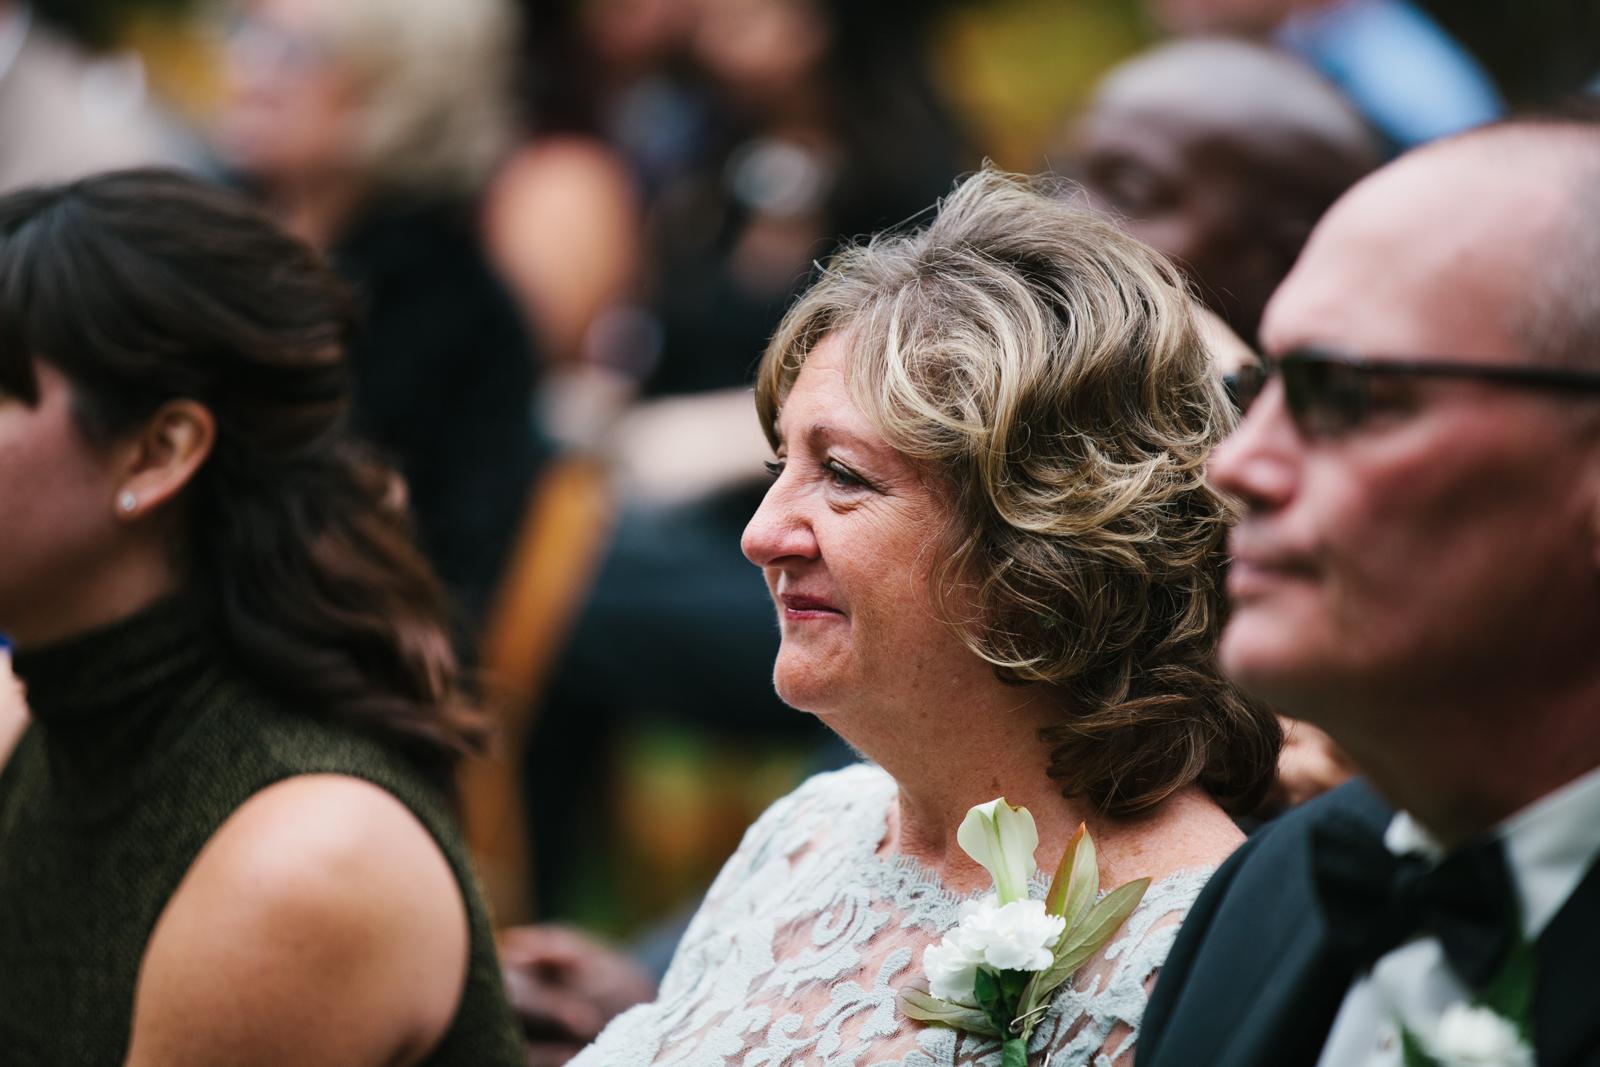 Glimmerstone-Mansion-Vermont-Wedding-Photography-Amanda-Morgan-56.jpg